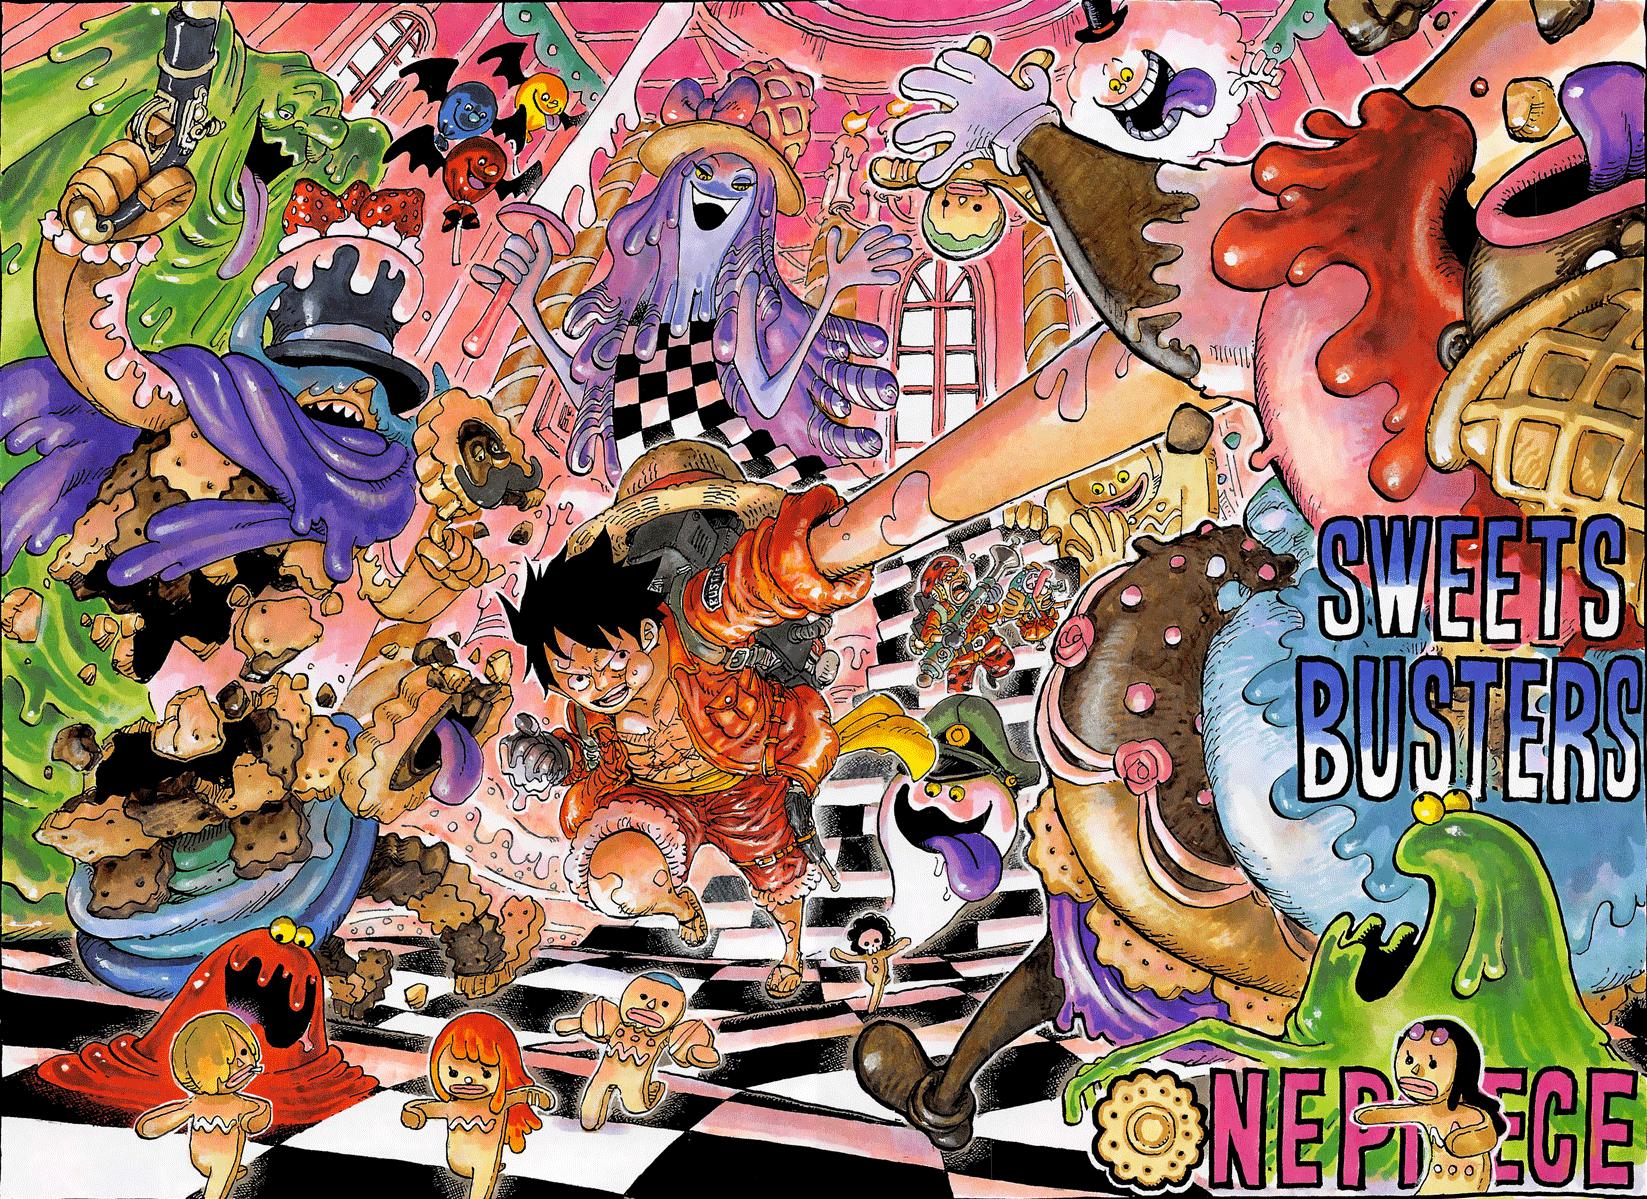 One Piece One Piece Fondo De Pantalla 41588621 Fanpop